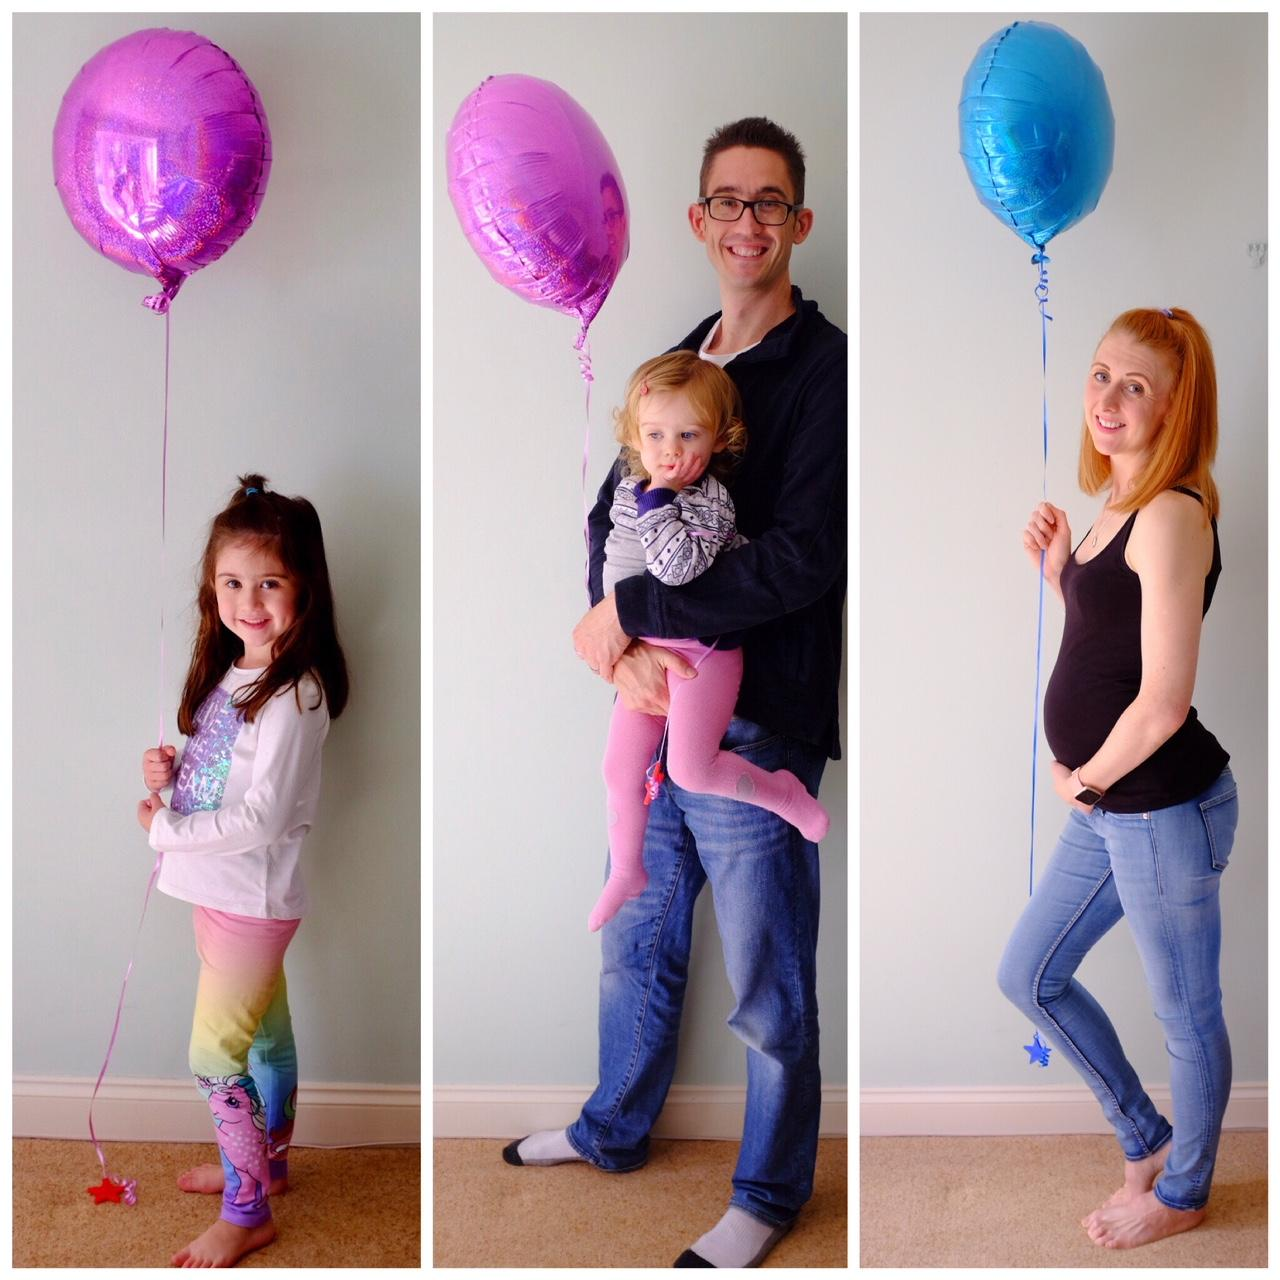 16 Weeks Pregnant – Bump Update